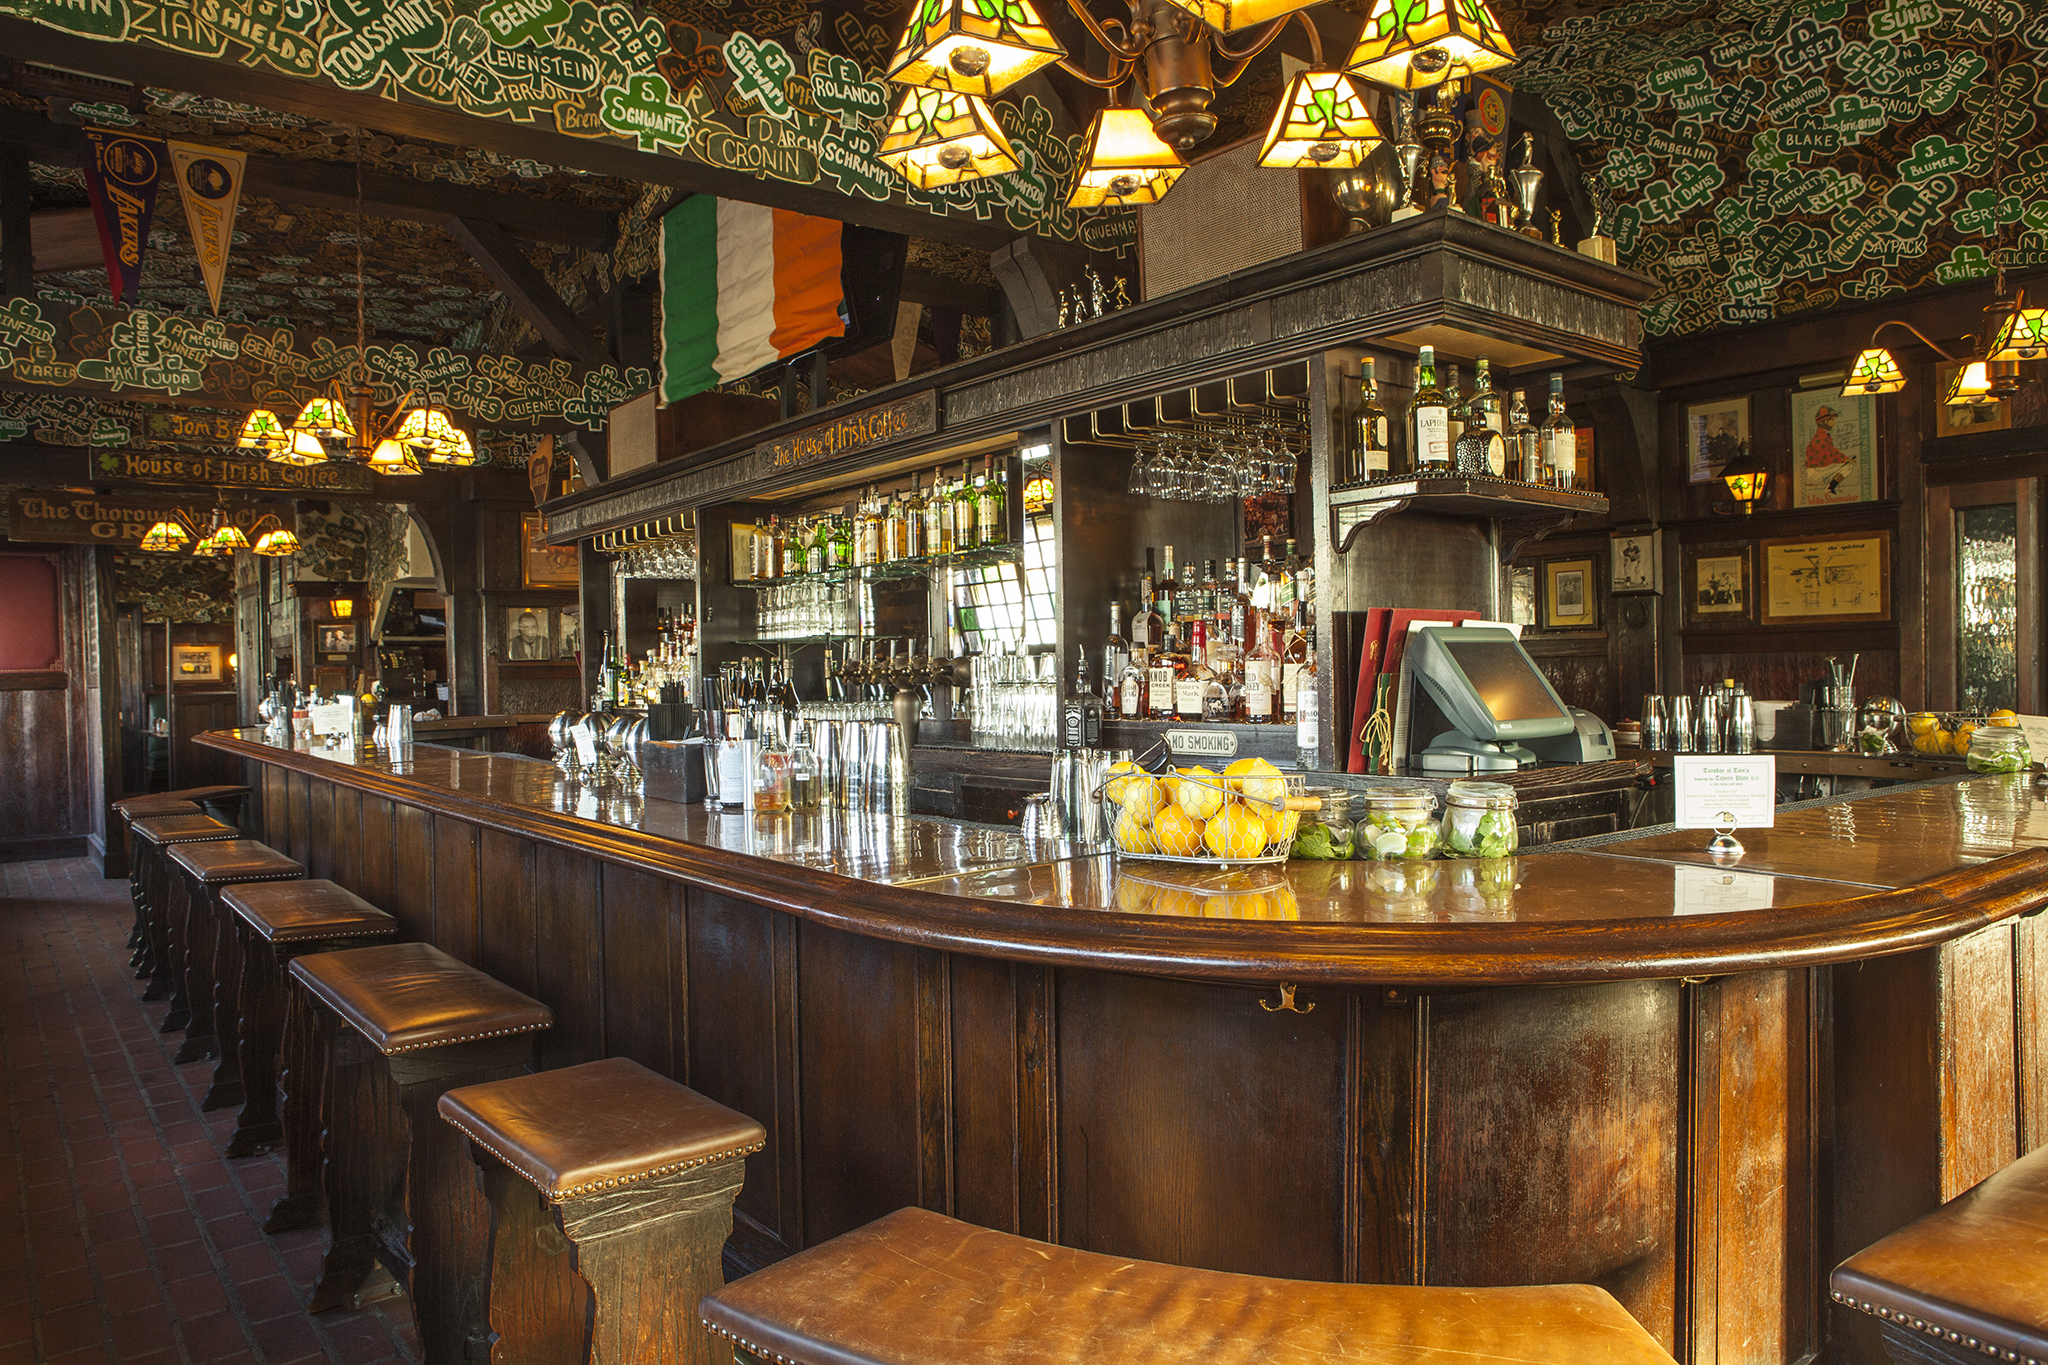 Tom Bergin's Tavern